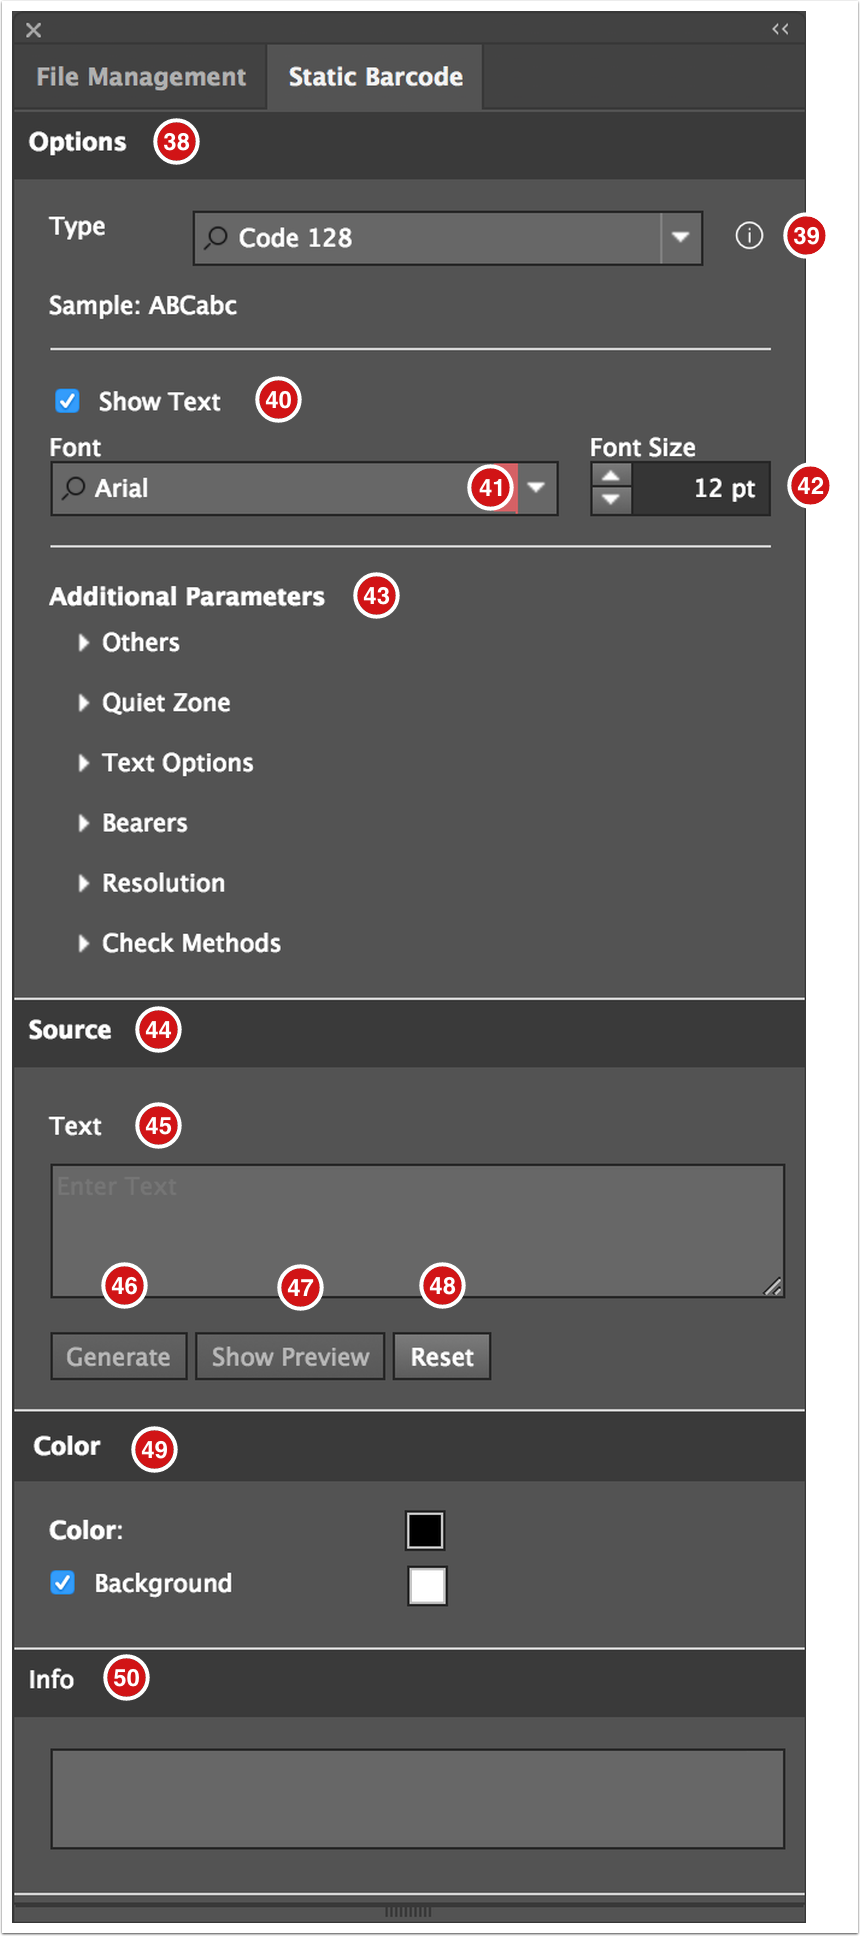 Adobe Illustrator Plug-in - Static Barcode panel